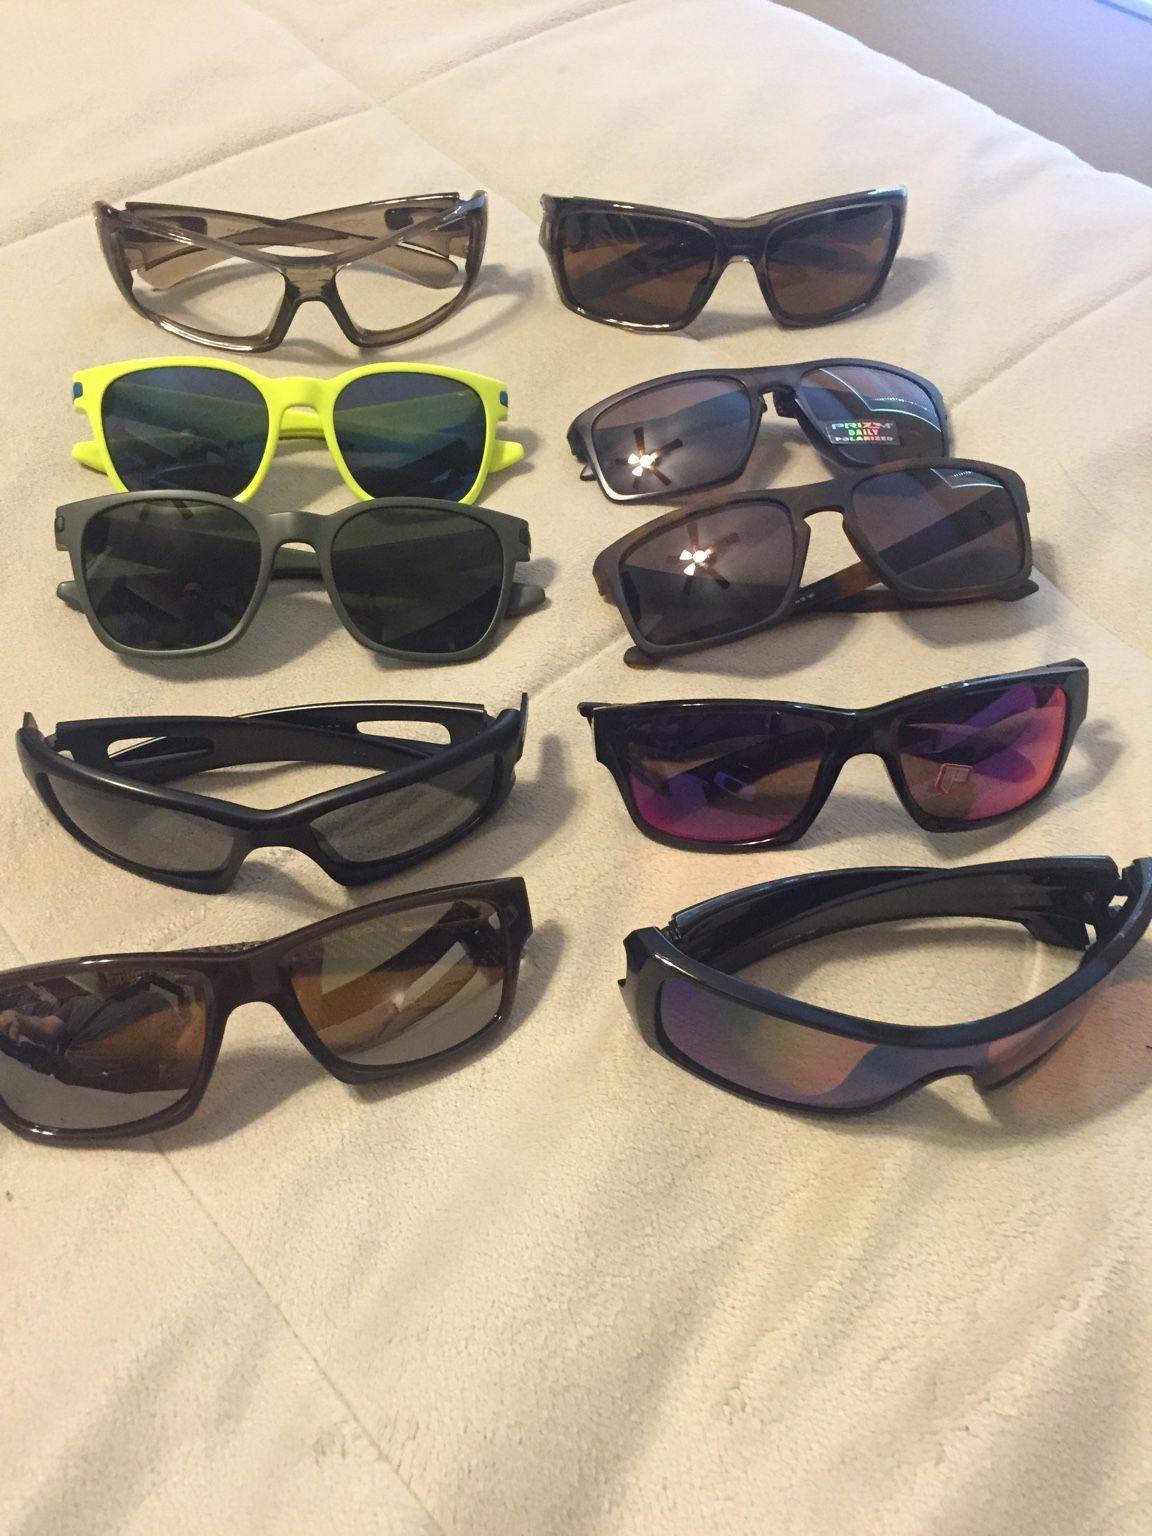 Many frames!!! EVEN LOWER!!!! Price drop!!!! - d2886107d8c1dd3aeb180e919780012f.jpg